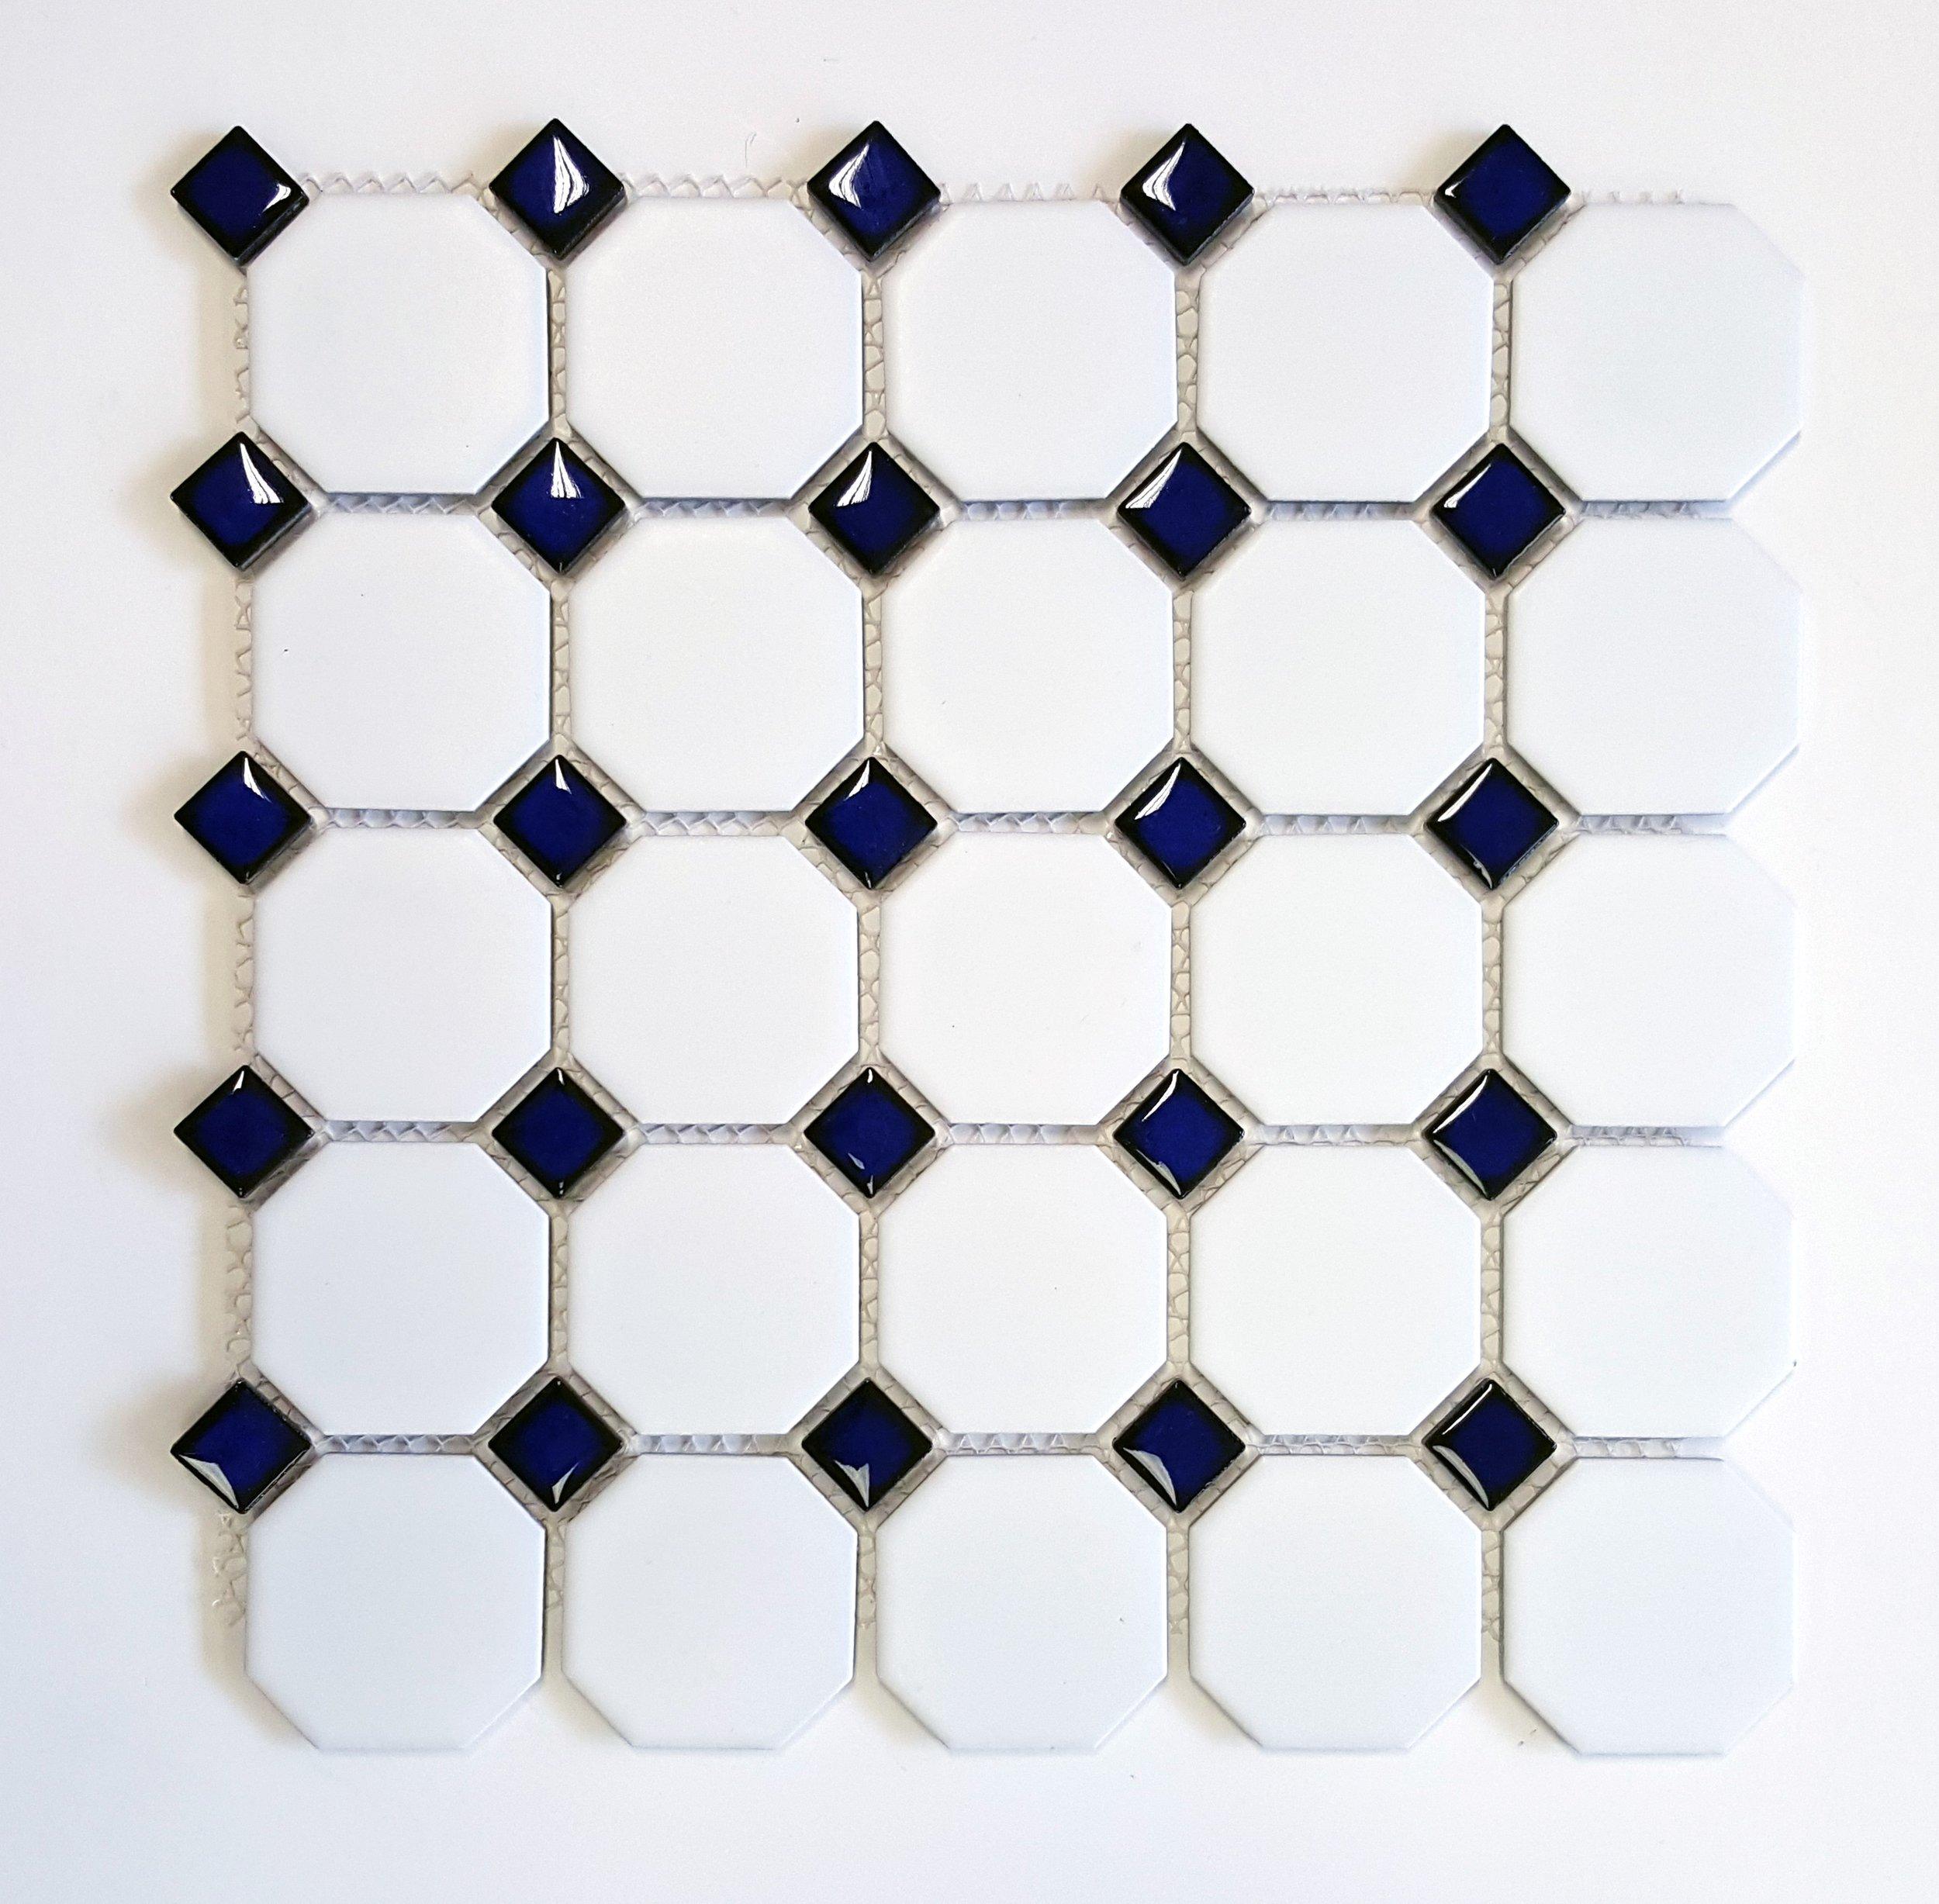 "OCT-513  Octagon 2-1/4"" Matte White w/ Shiny Cobalt Blue Dot"